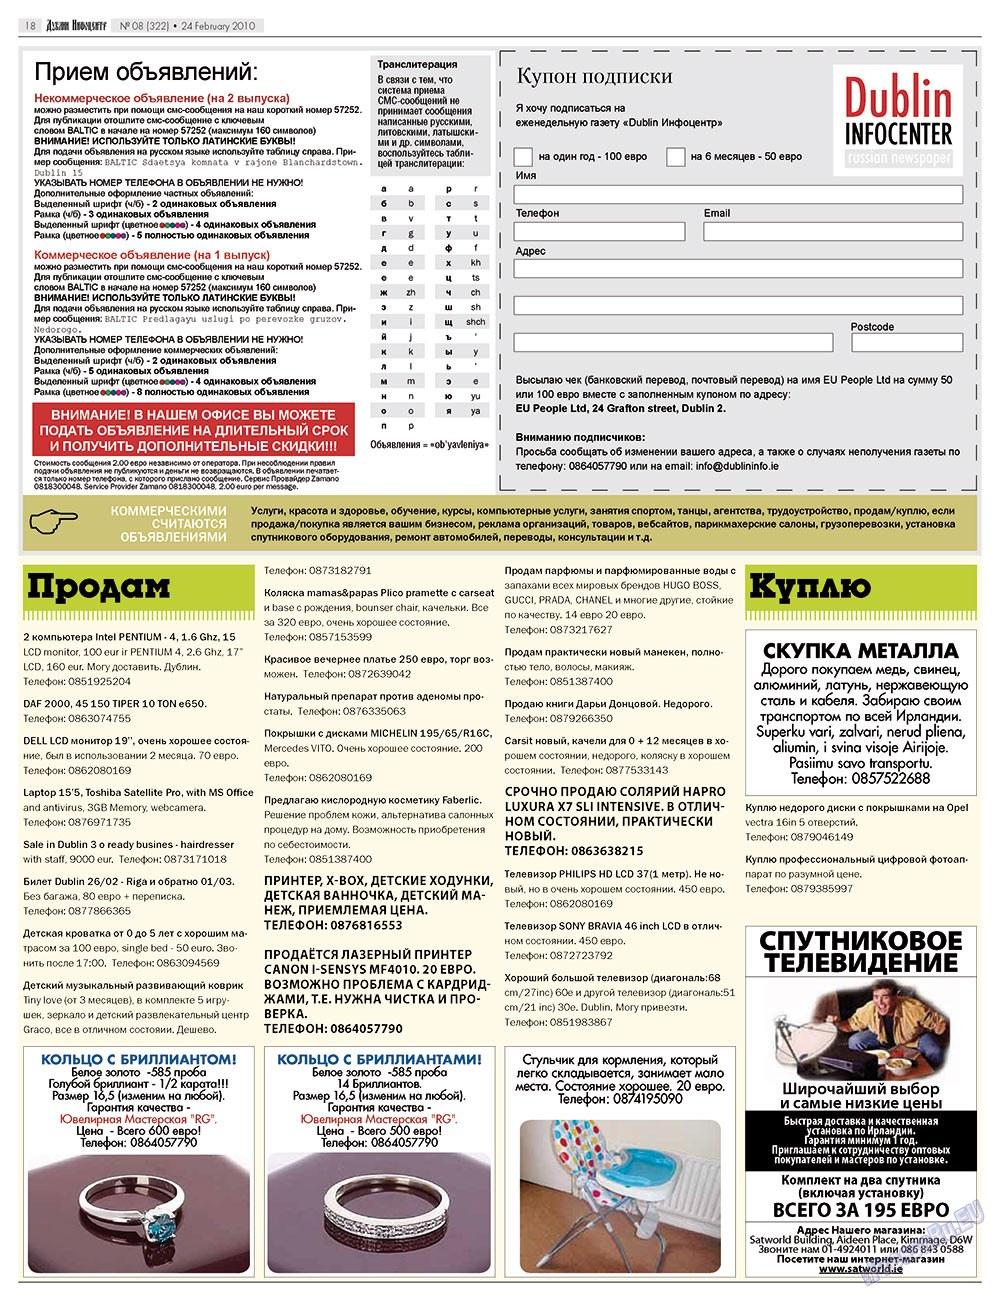 Дублин инфоцентр (газета). 2010 год, номер 8, стр. 18